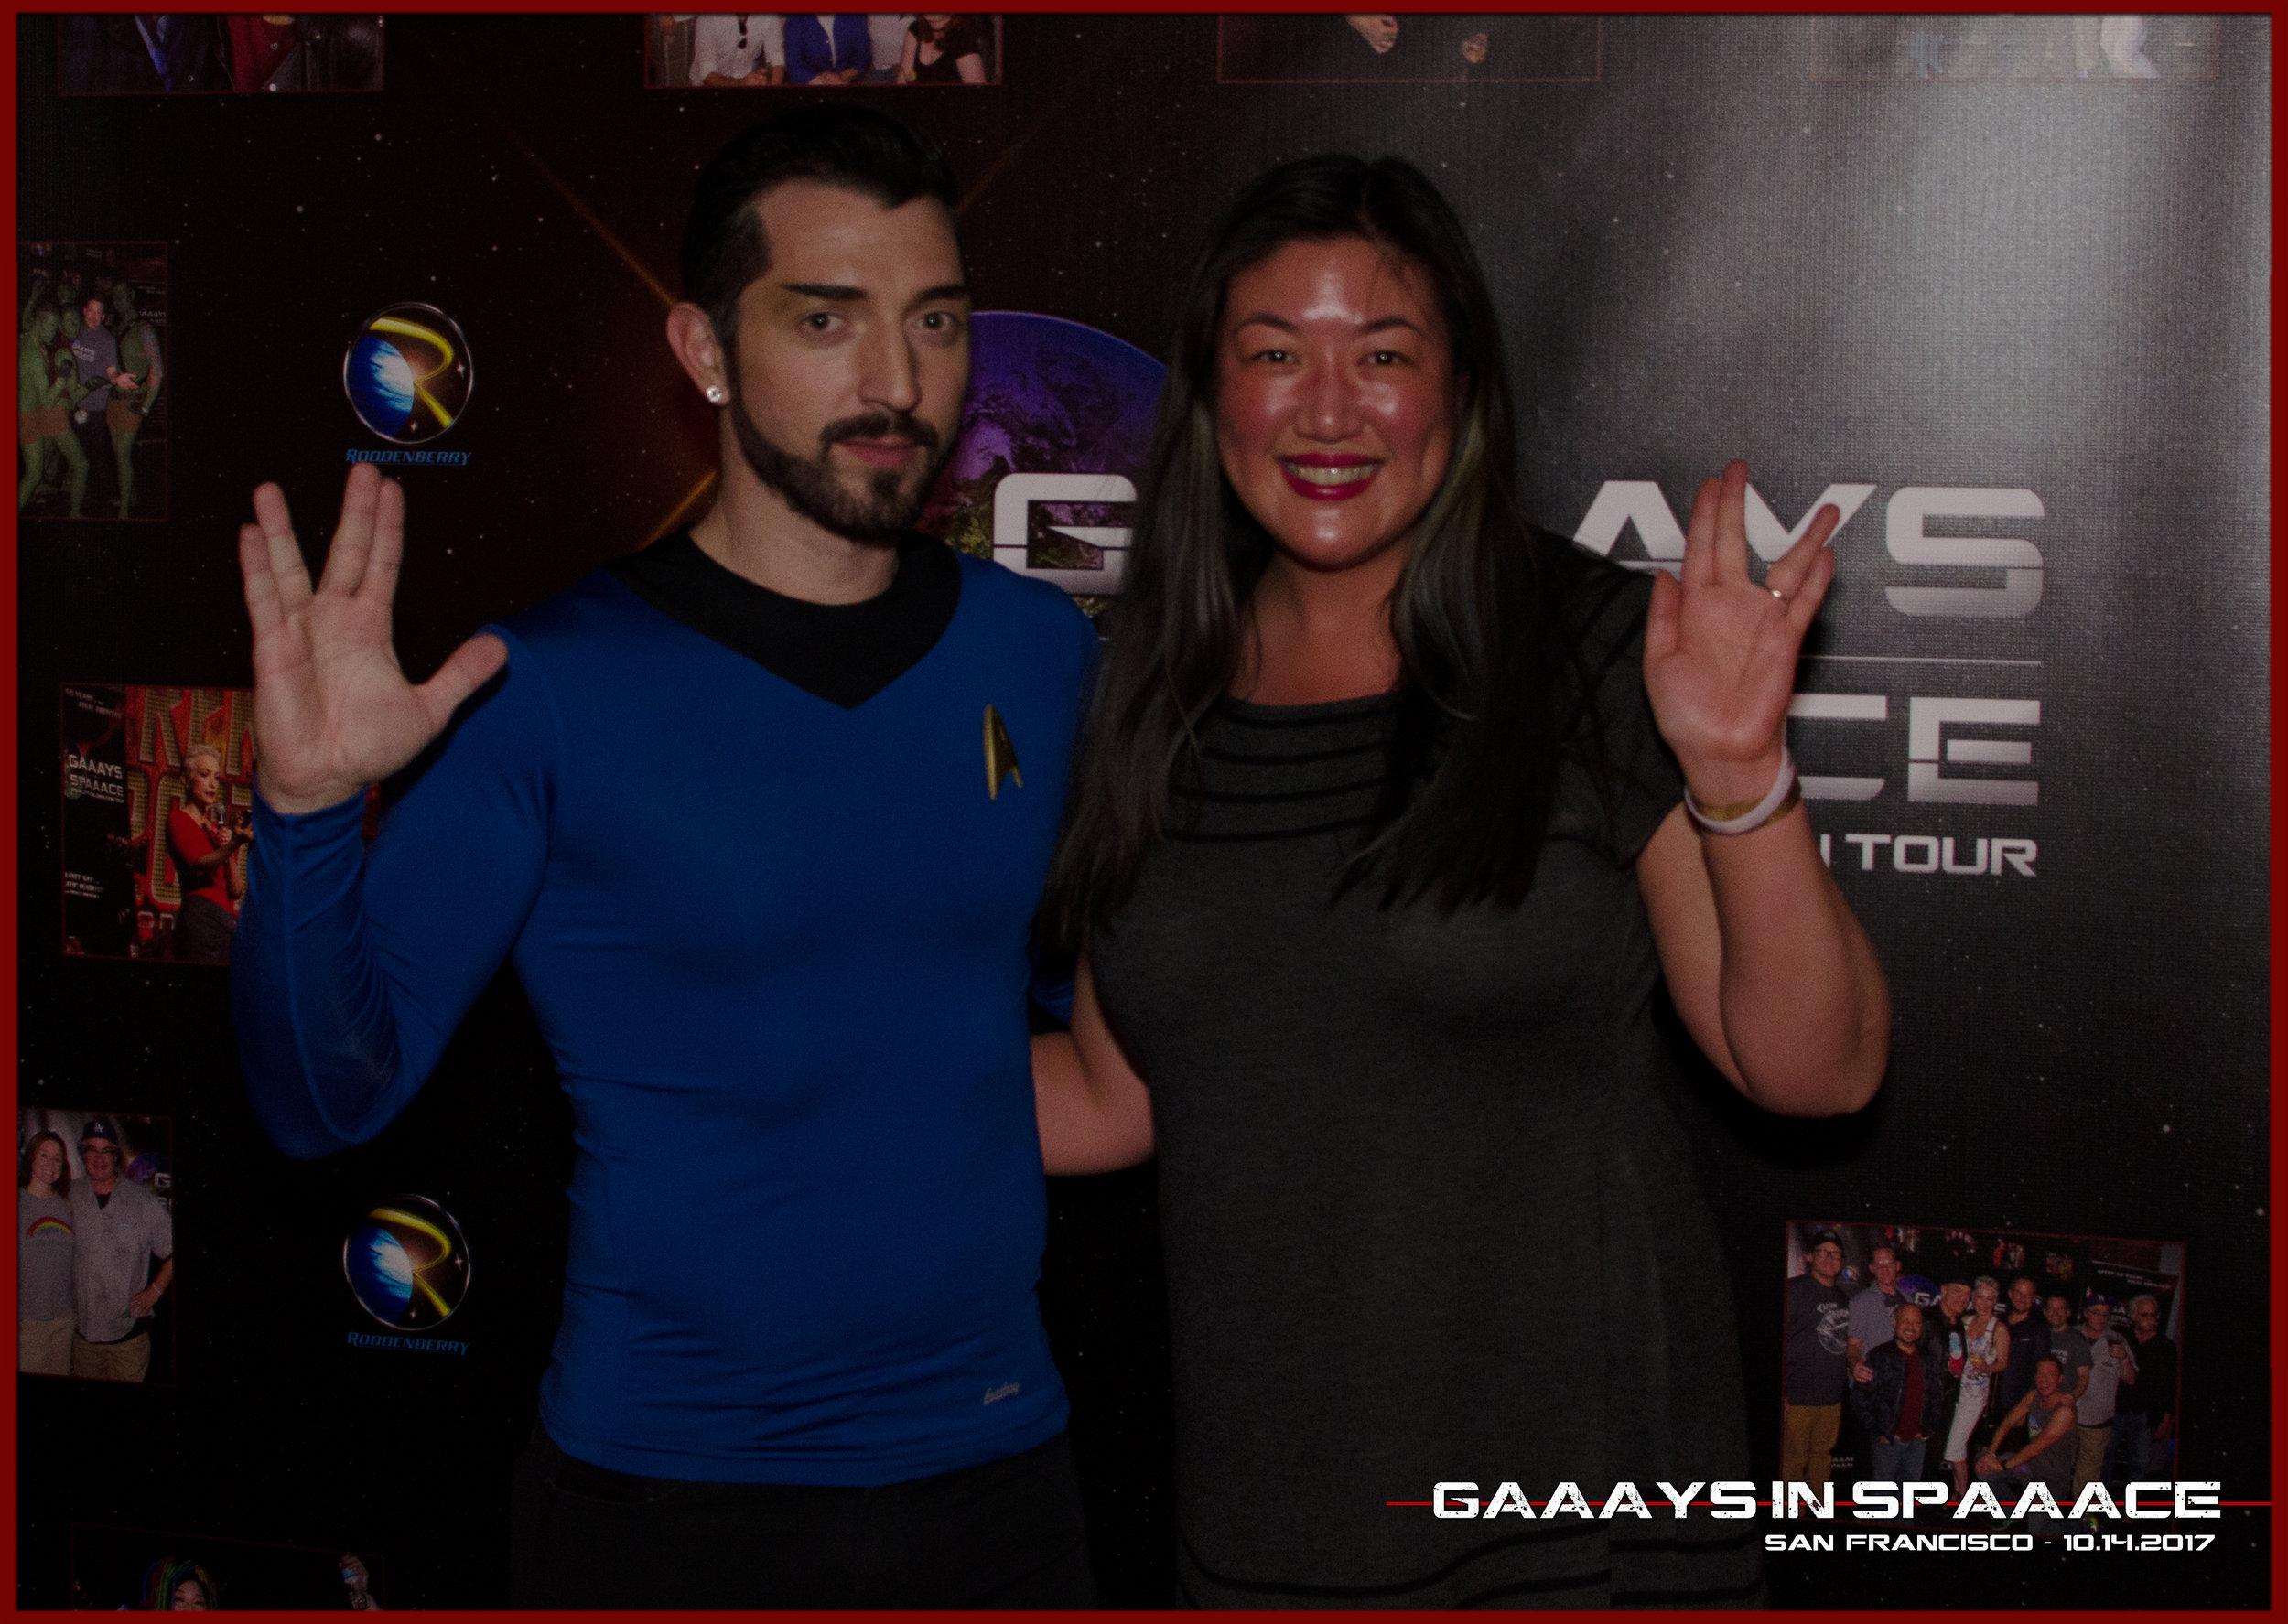 30-GIS-SF-10-14-2017-JimmyDurano-Fans-6.jpg